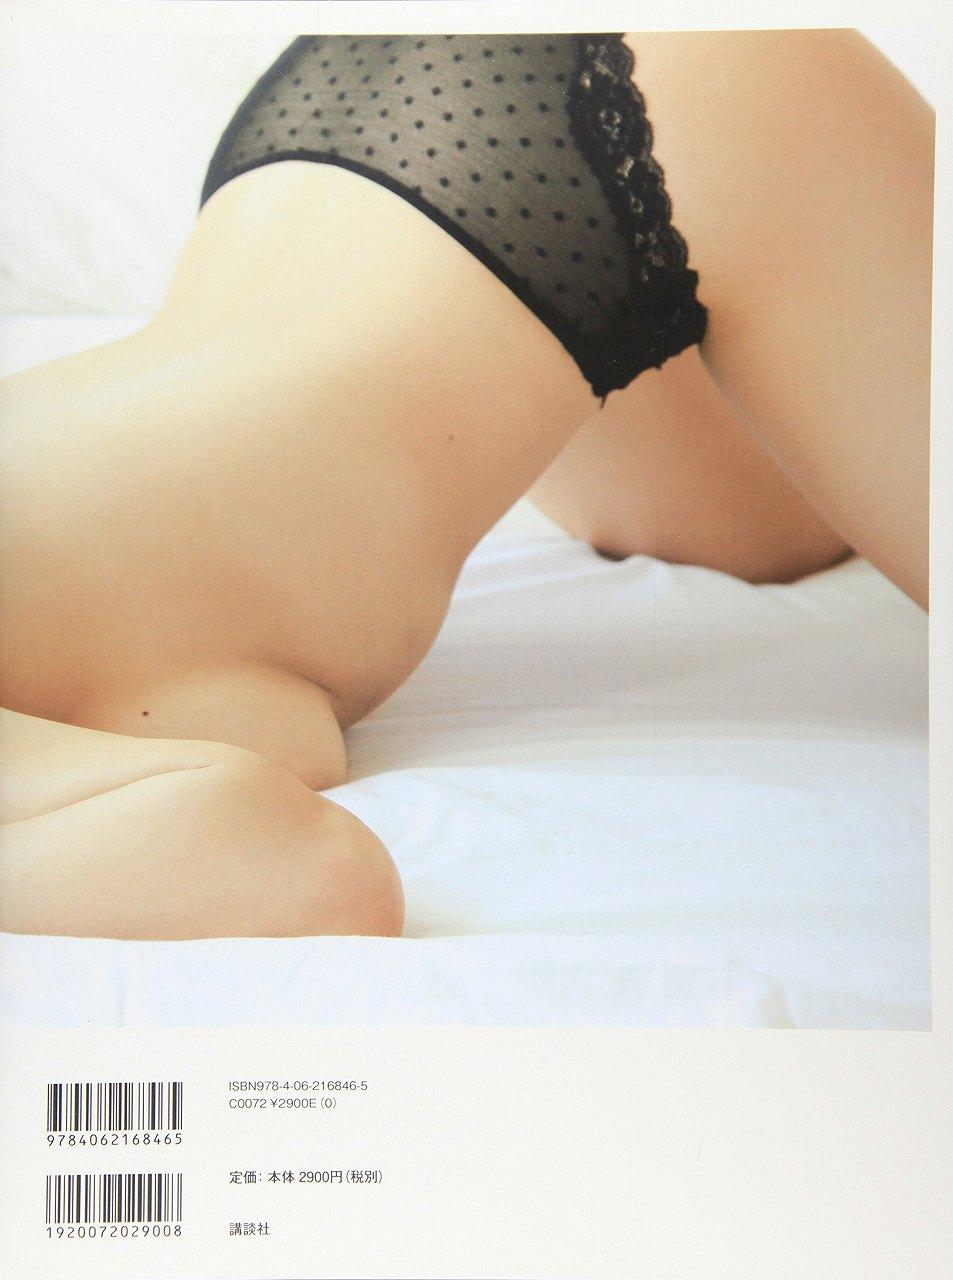 古瀬絵理の写真集「蜜[mits]」表紙